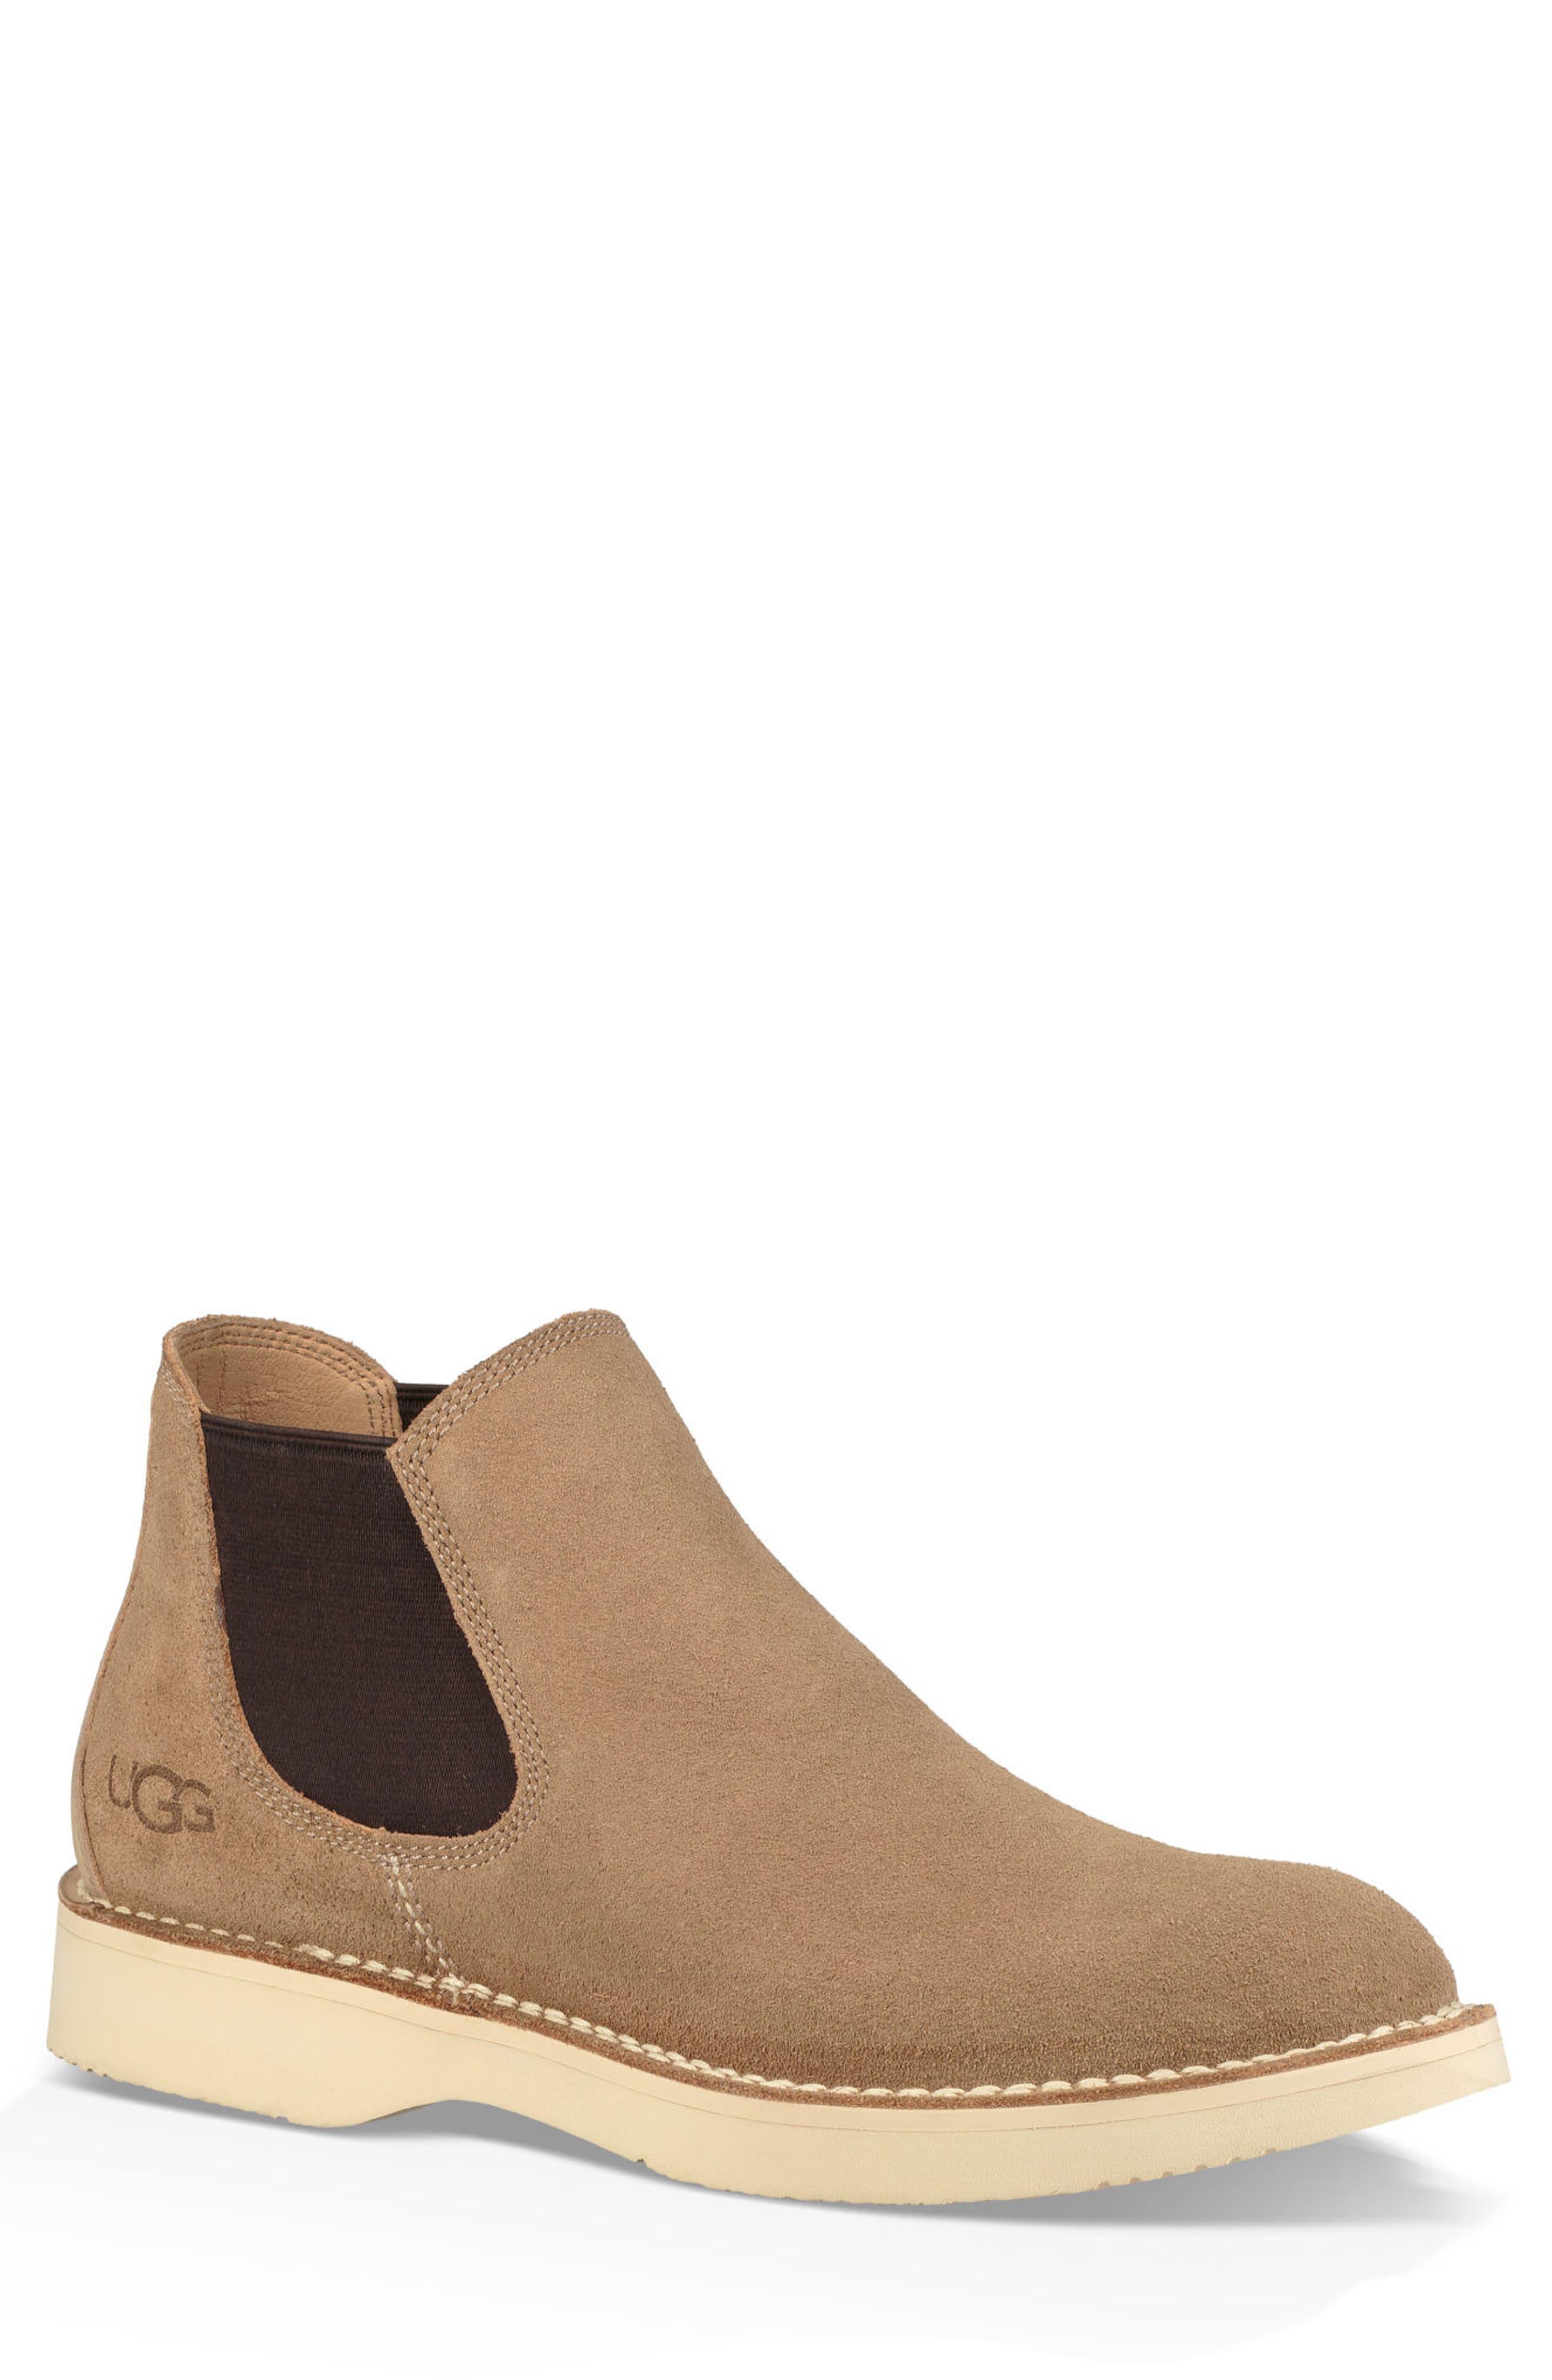 UGG<SUP>®</SUP> Camino Chelsea Boot, Main, color, DESERT TAN